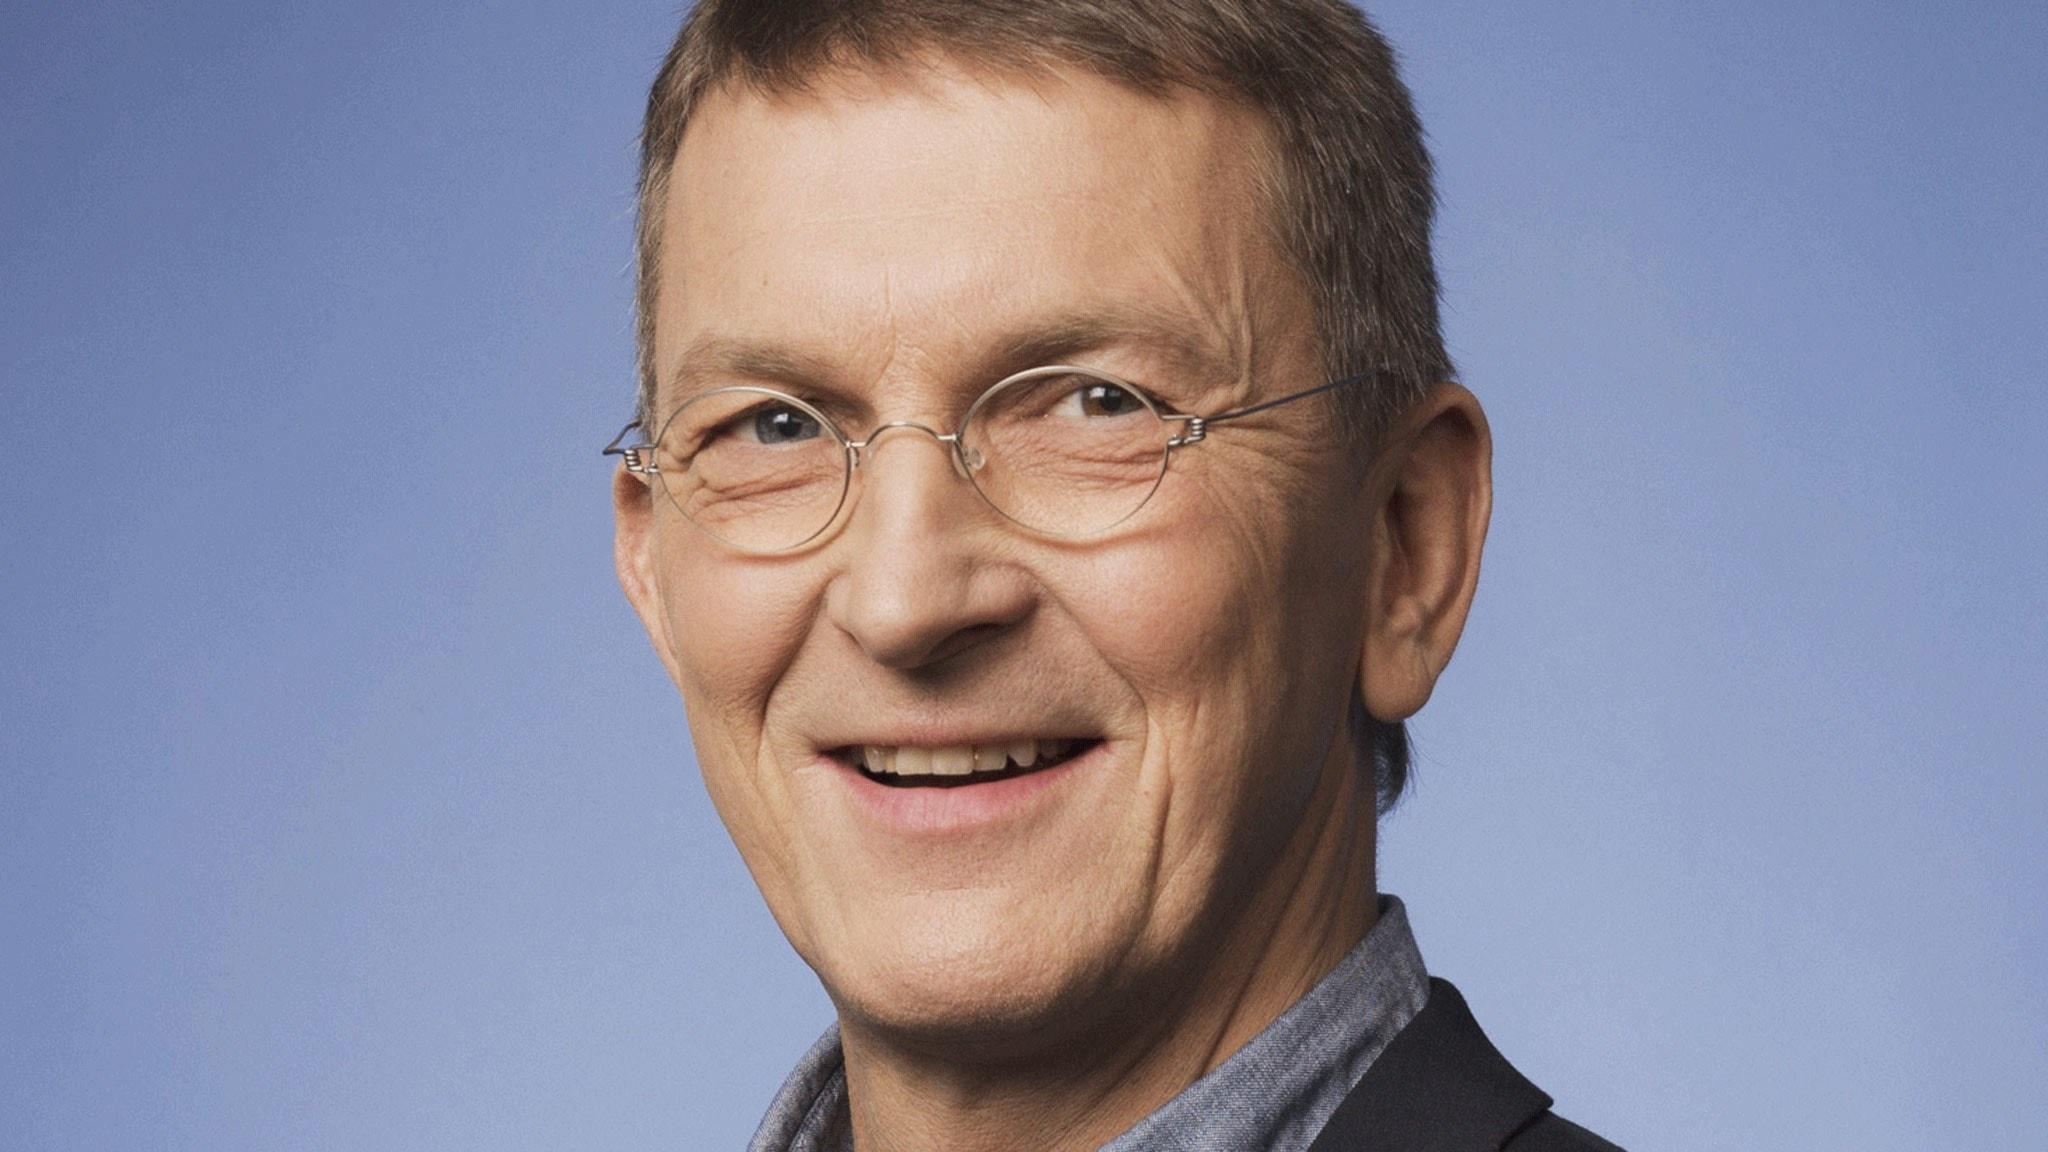 Tomas Sjödin